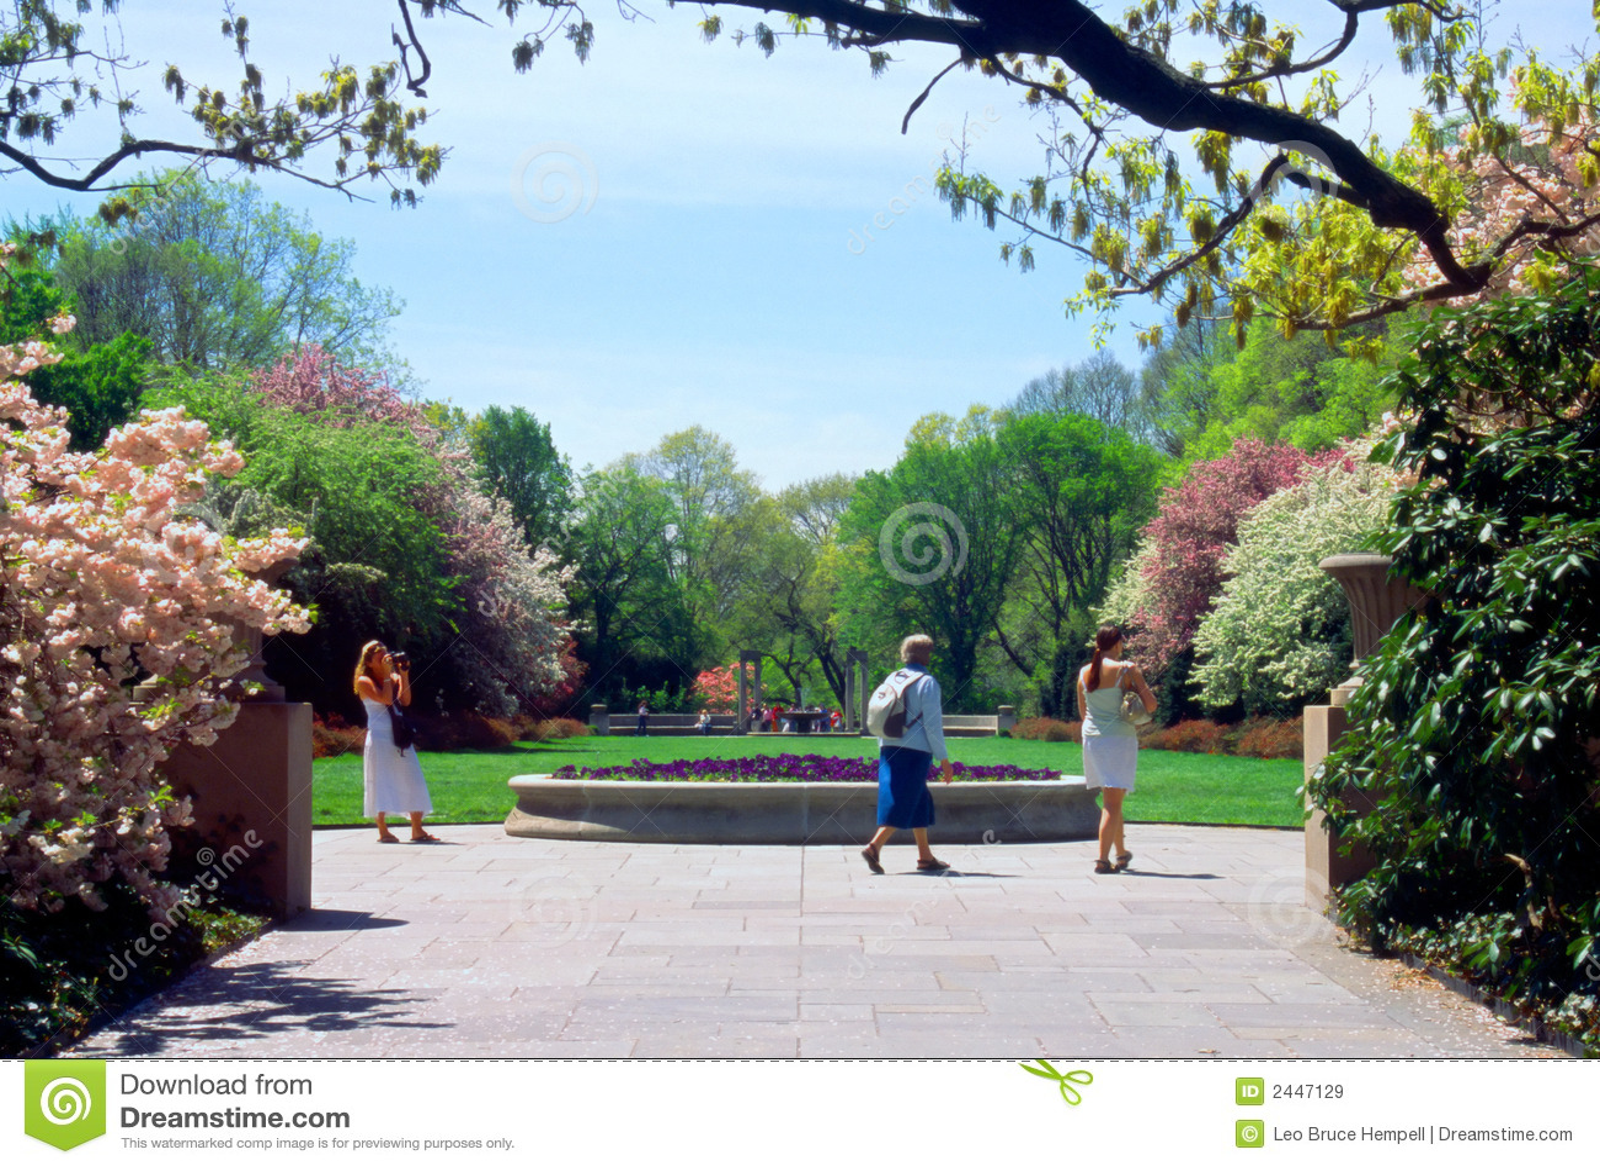 Jardin botanique de brooklyn image stock image du for Giardino 54 nyc